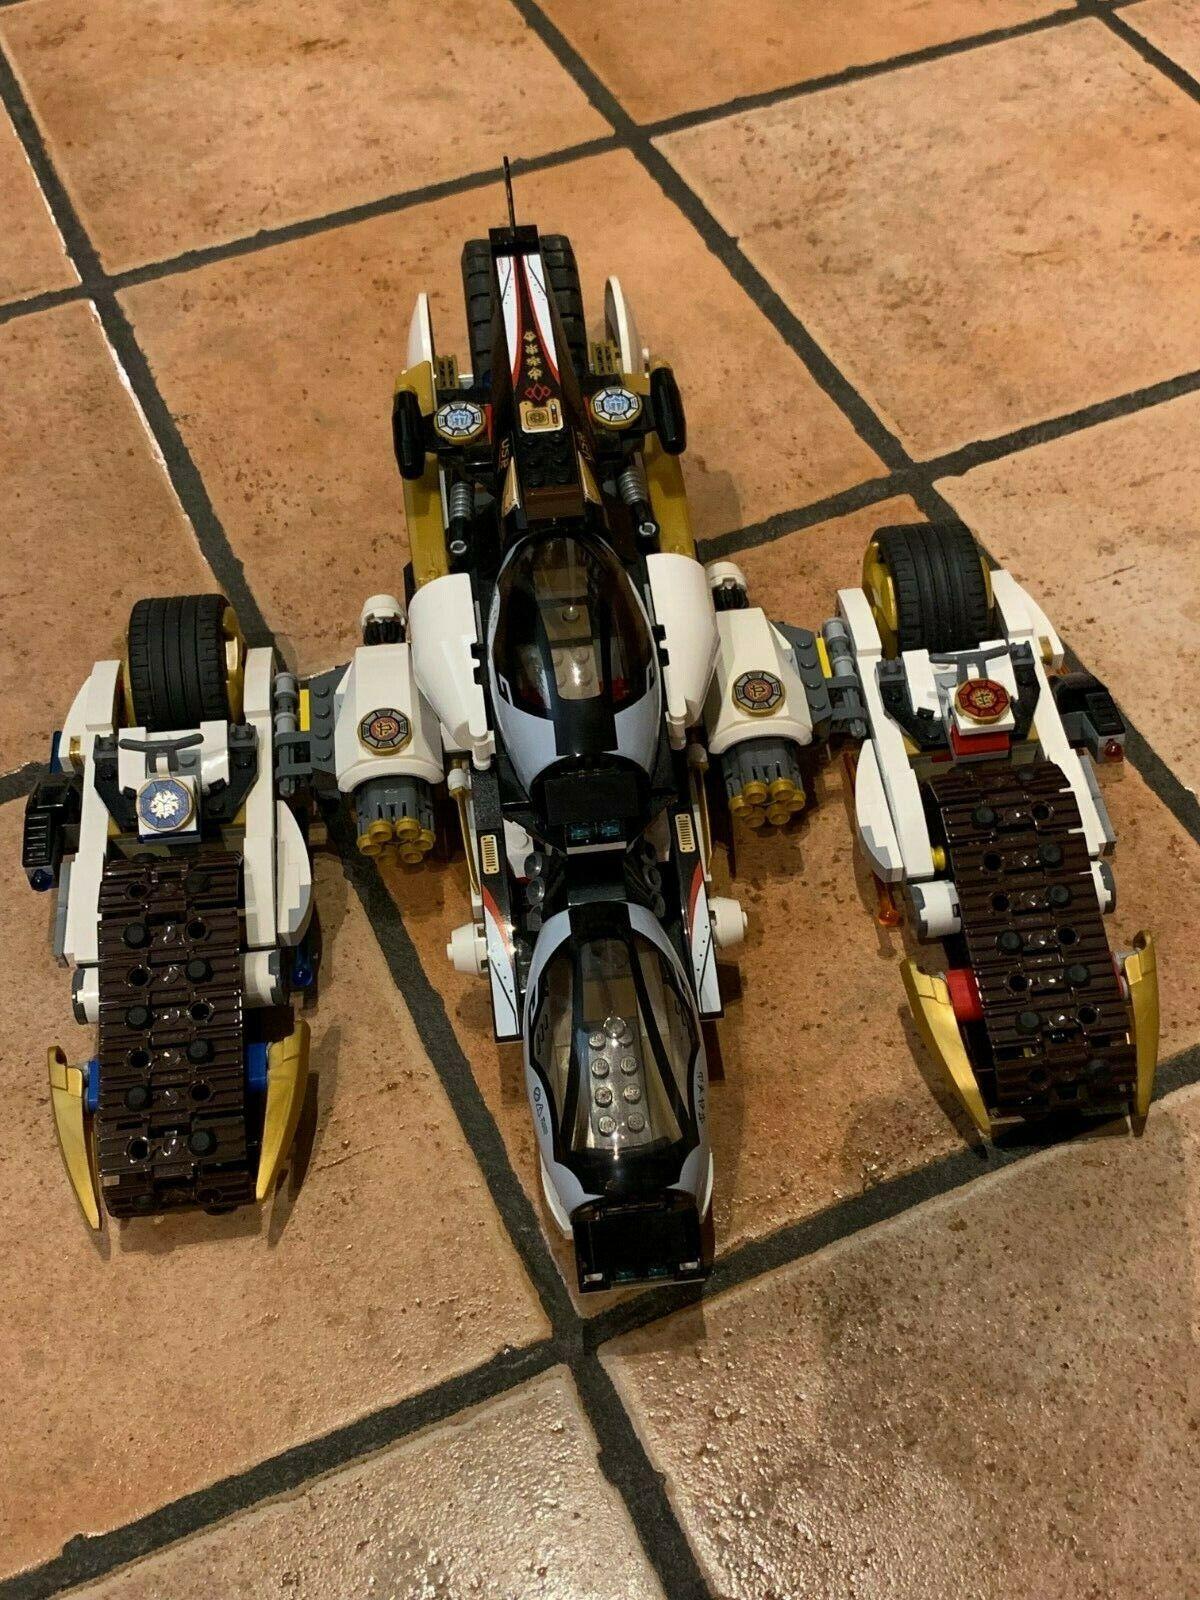 LEGO NINJAGO ULTRA STEALTH RAIDER + ISTRUZIONI - NO MINIFIGURES